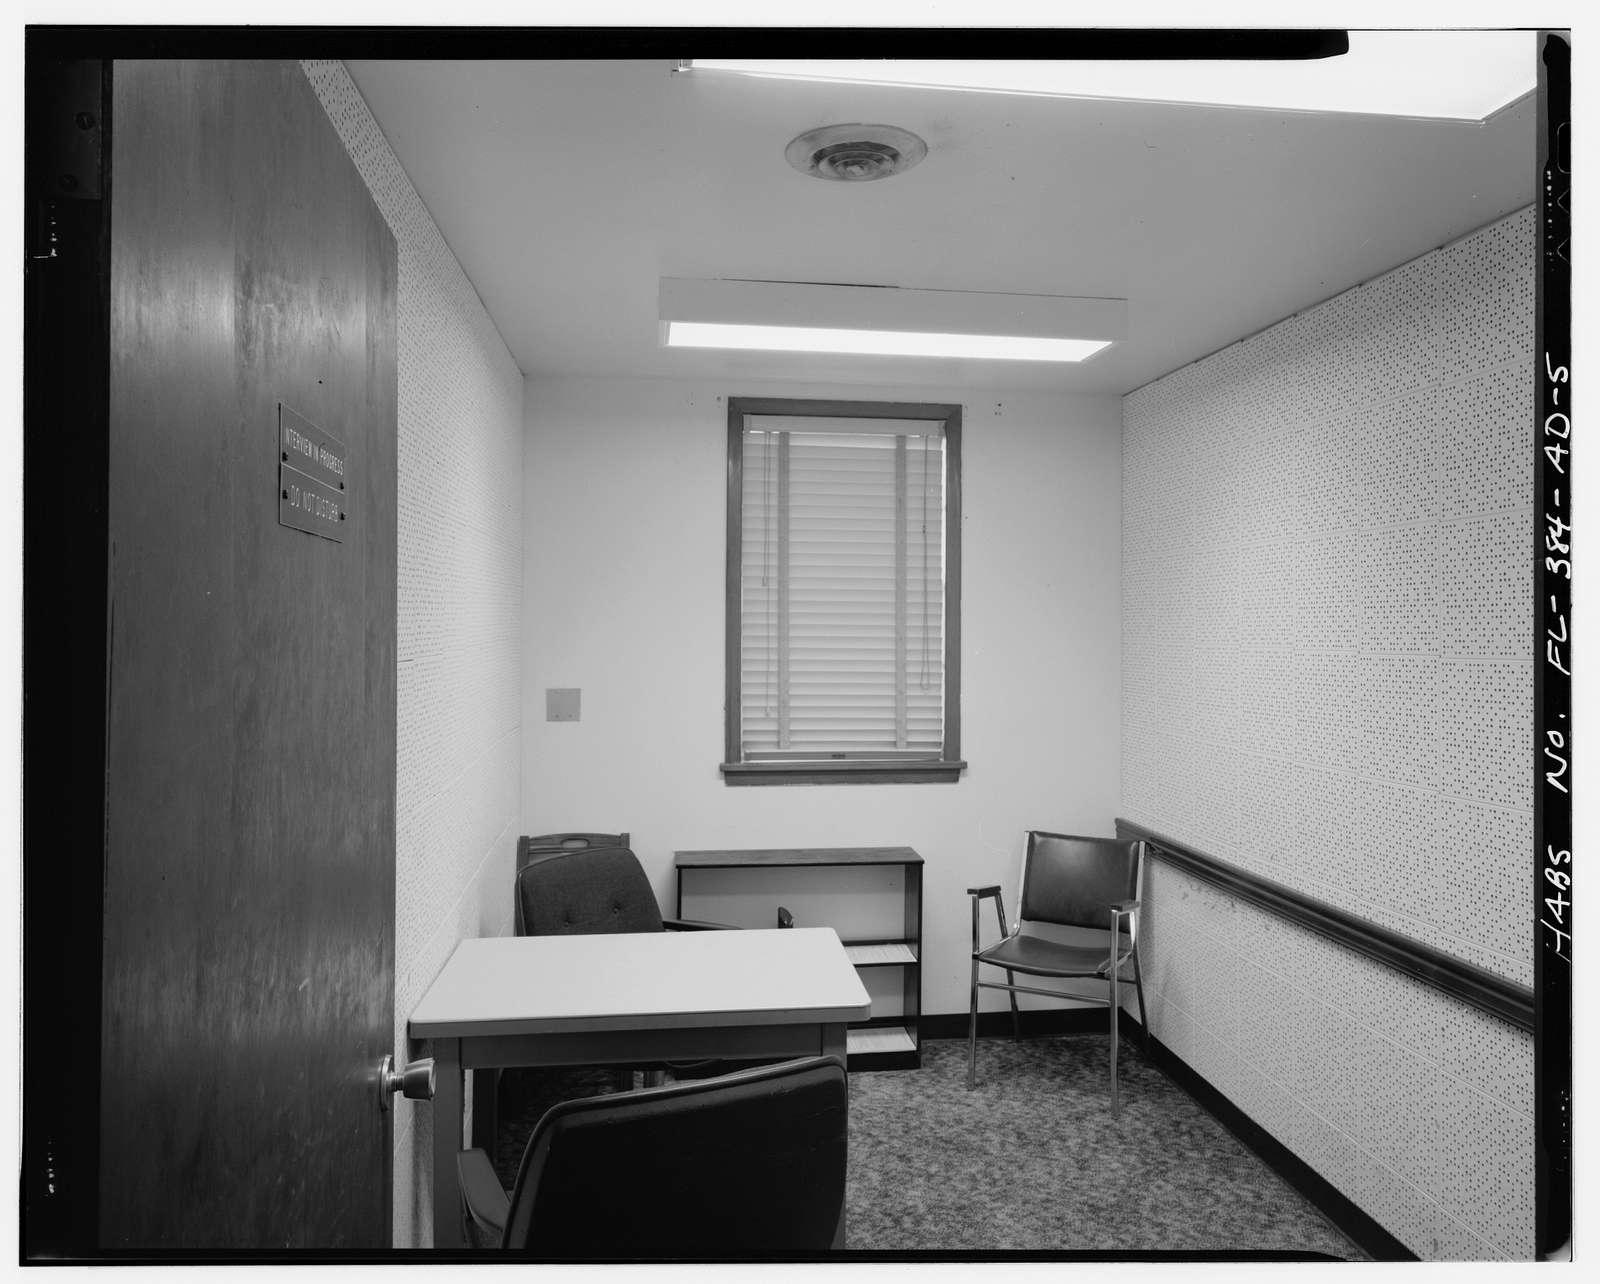 MacDill Air Force Base, Parachute Building, 2700 Eagle Staff Court, Tampa, Hillsborough County, FL